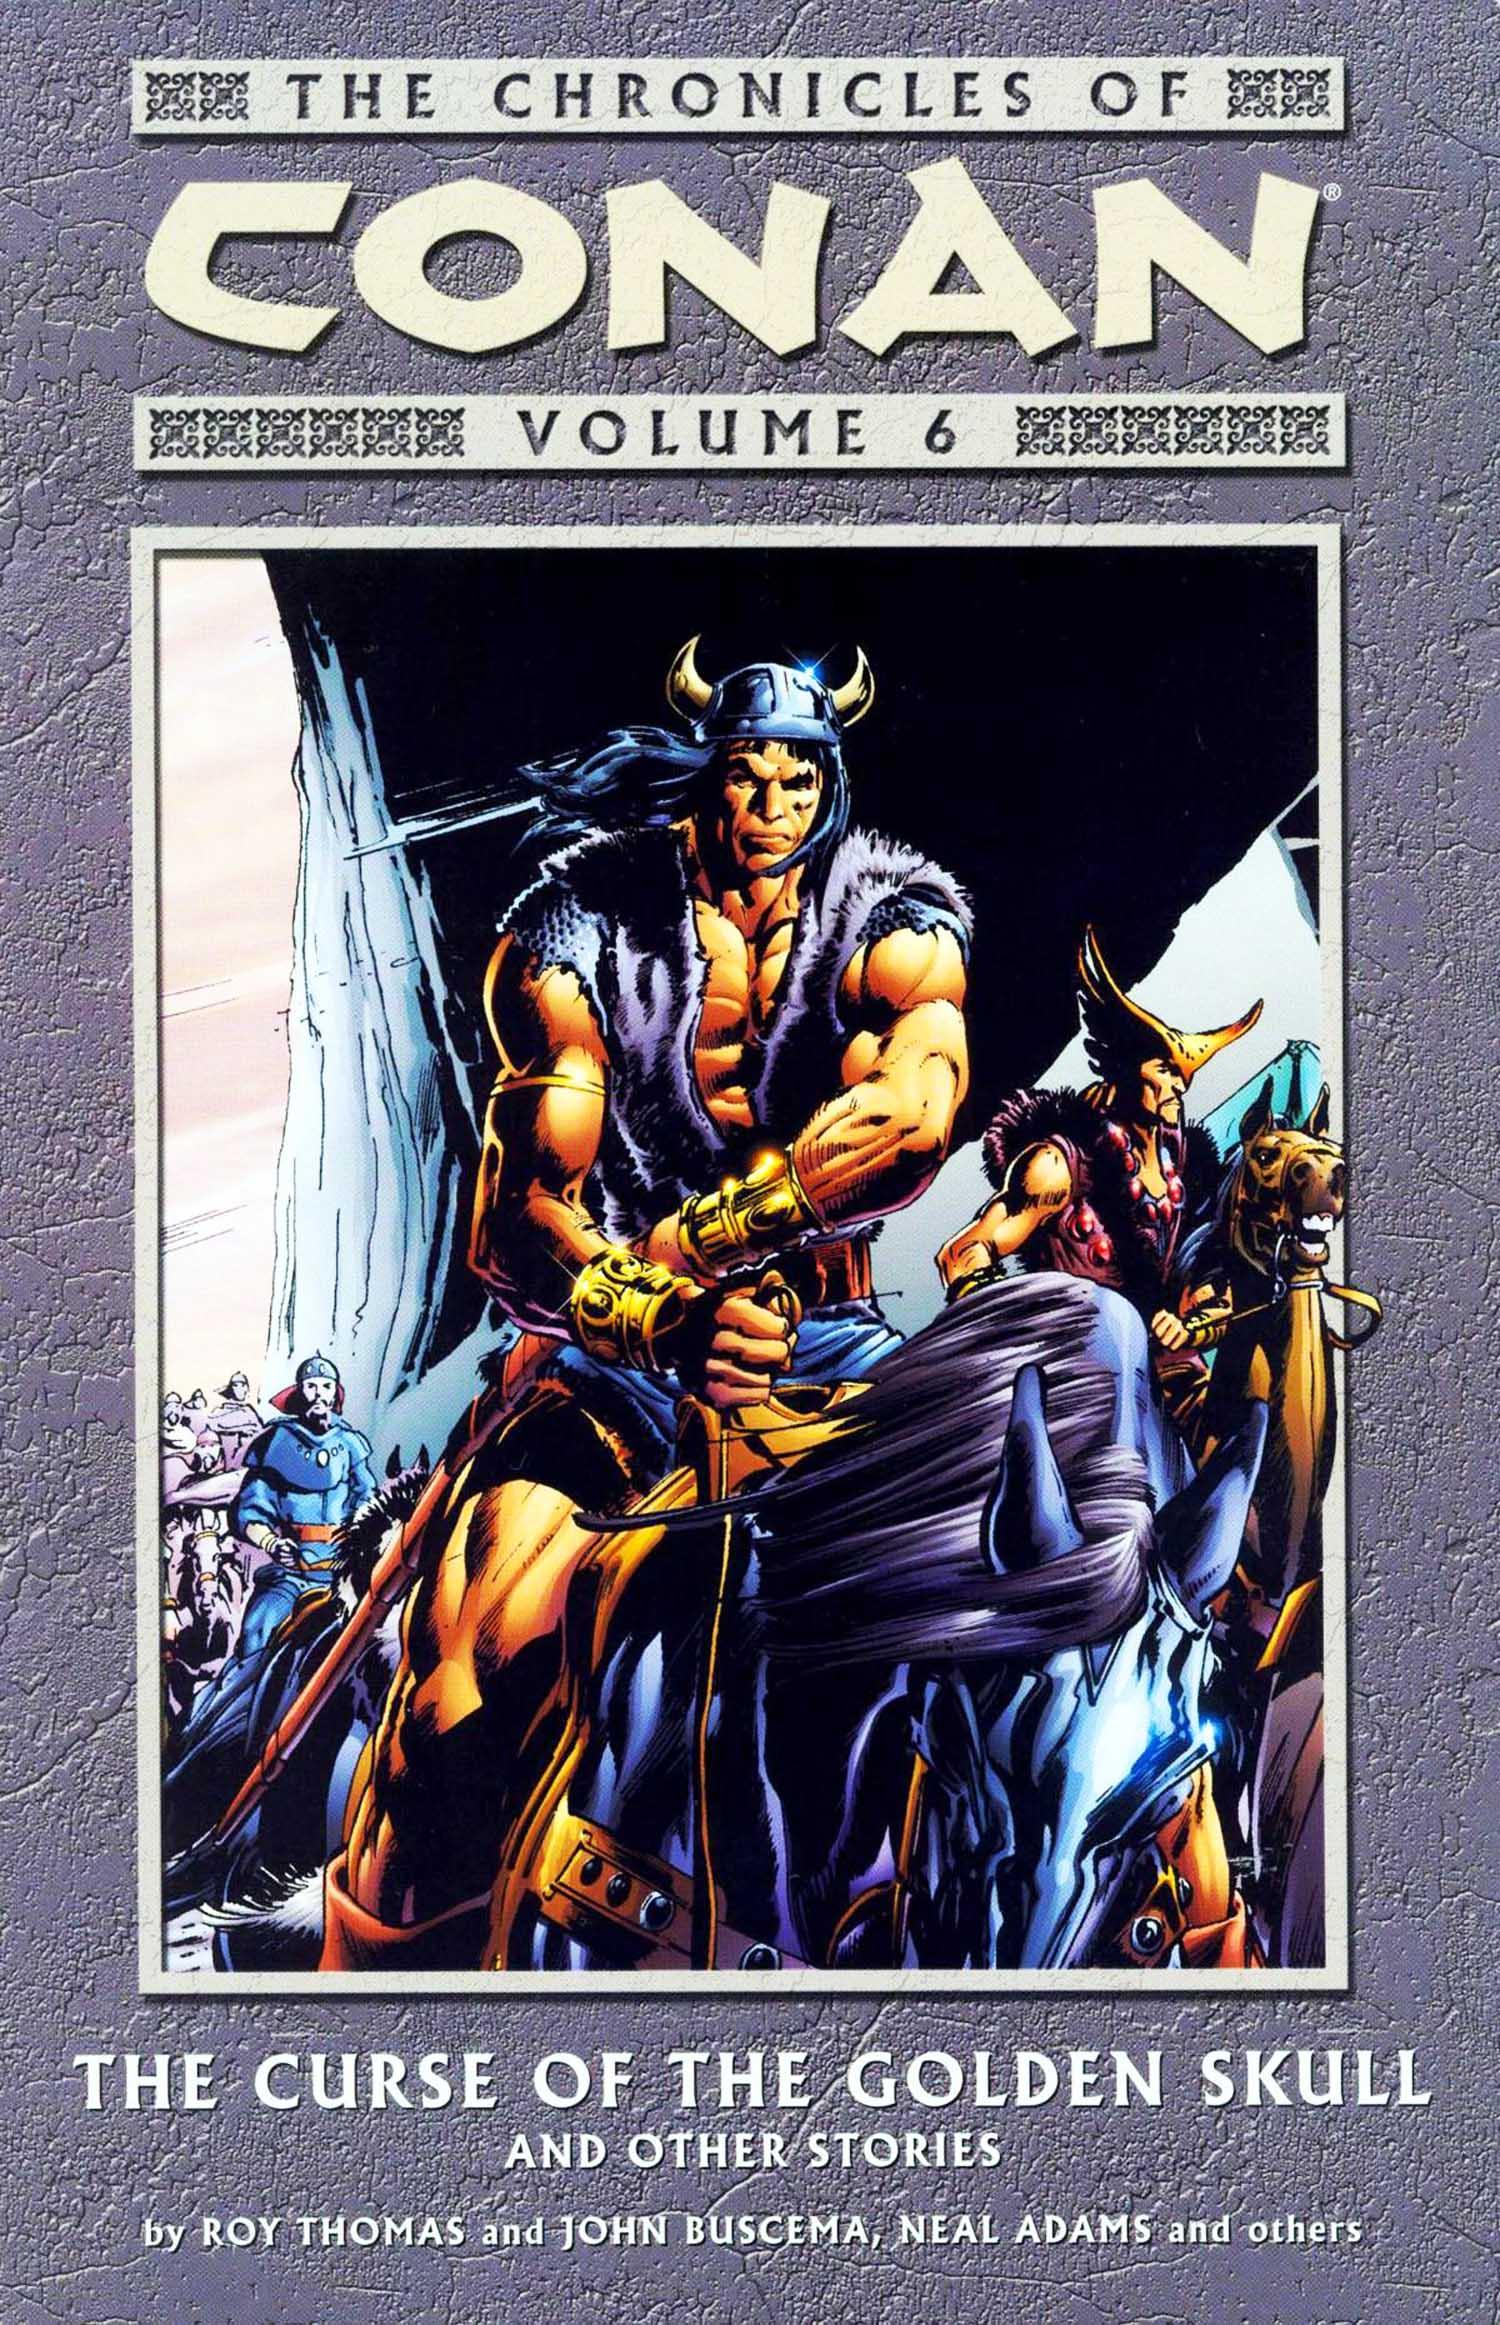 The Chronicles of Conan Volume 6